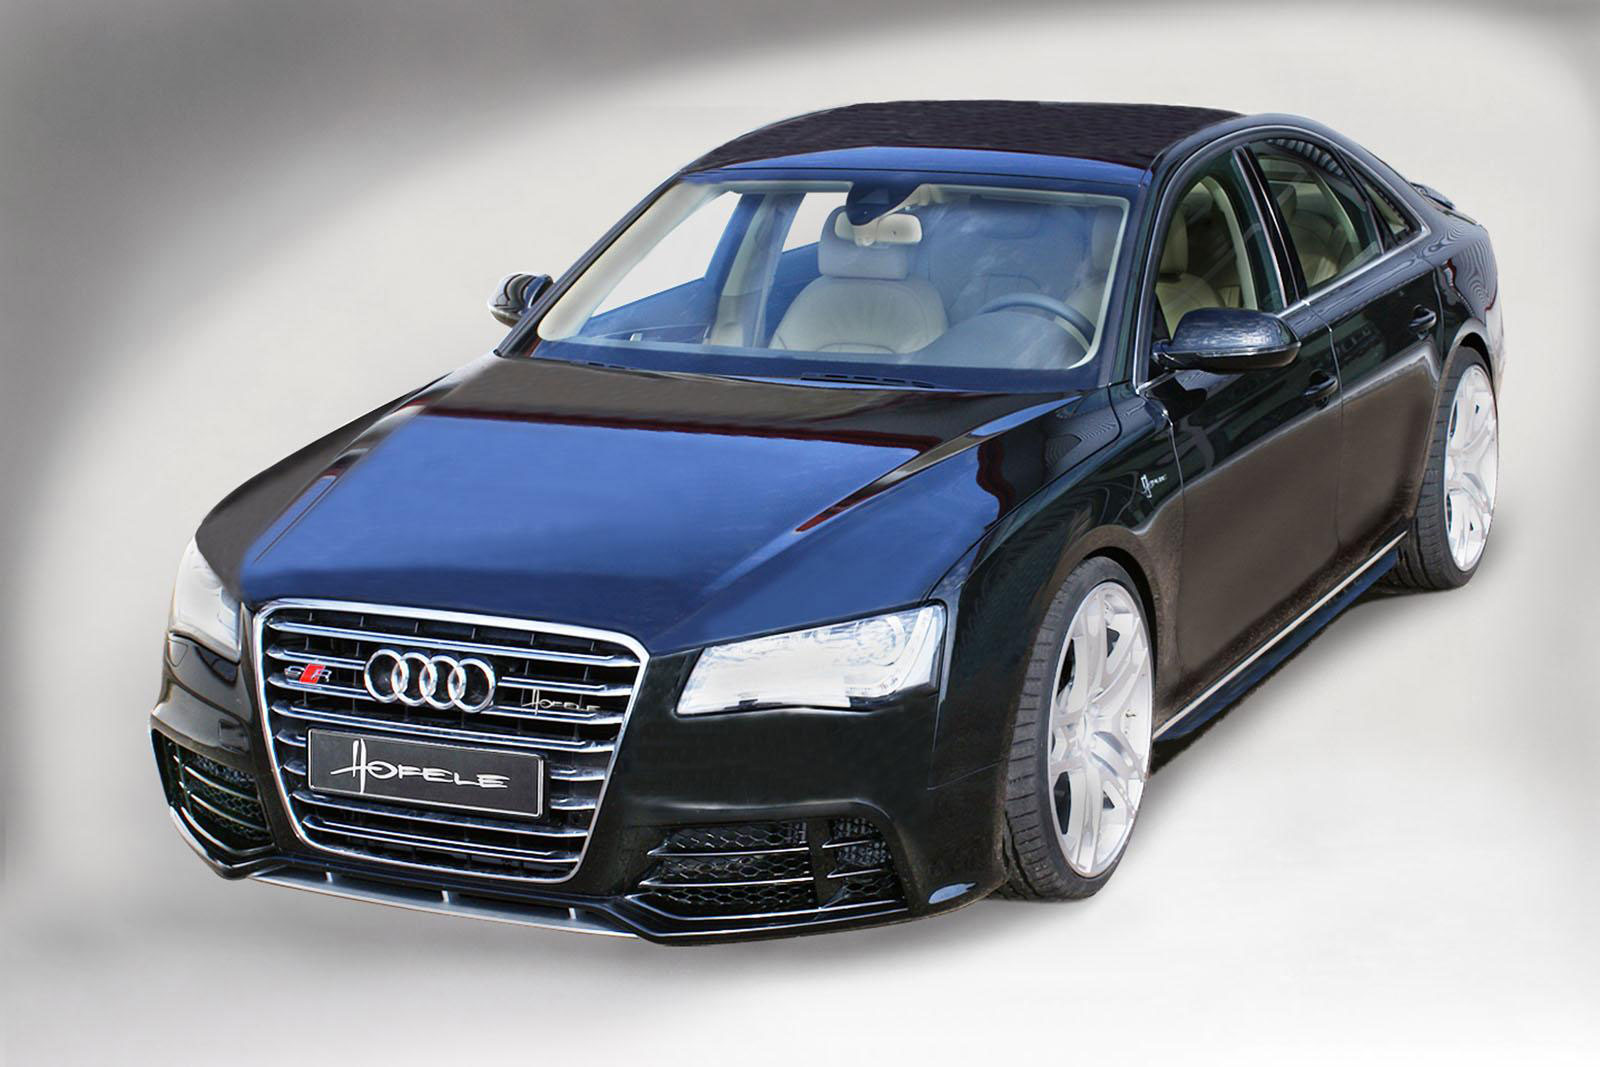 Hofele Design elegantně upravil Audi A8 2